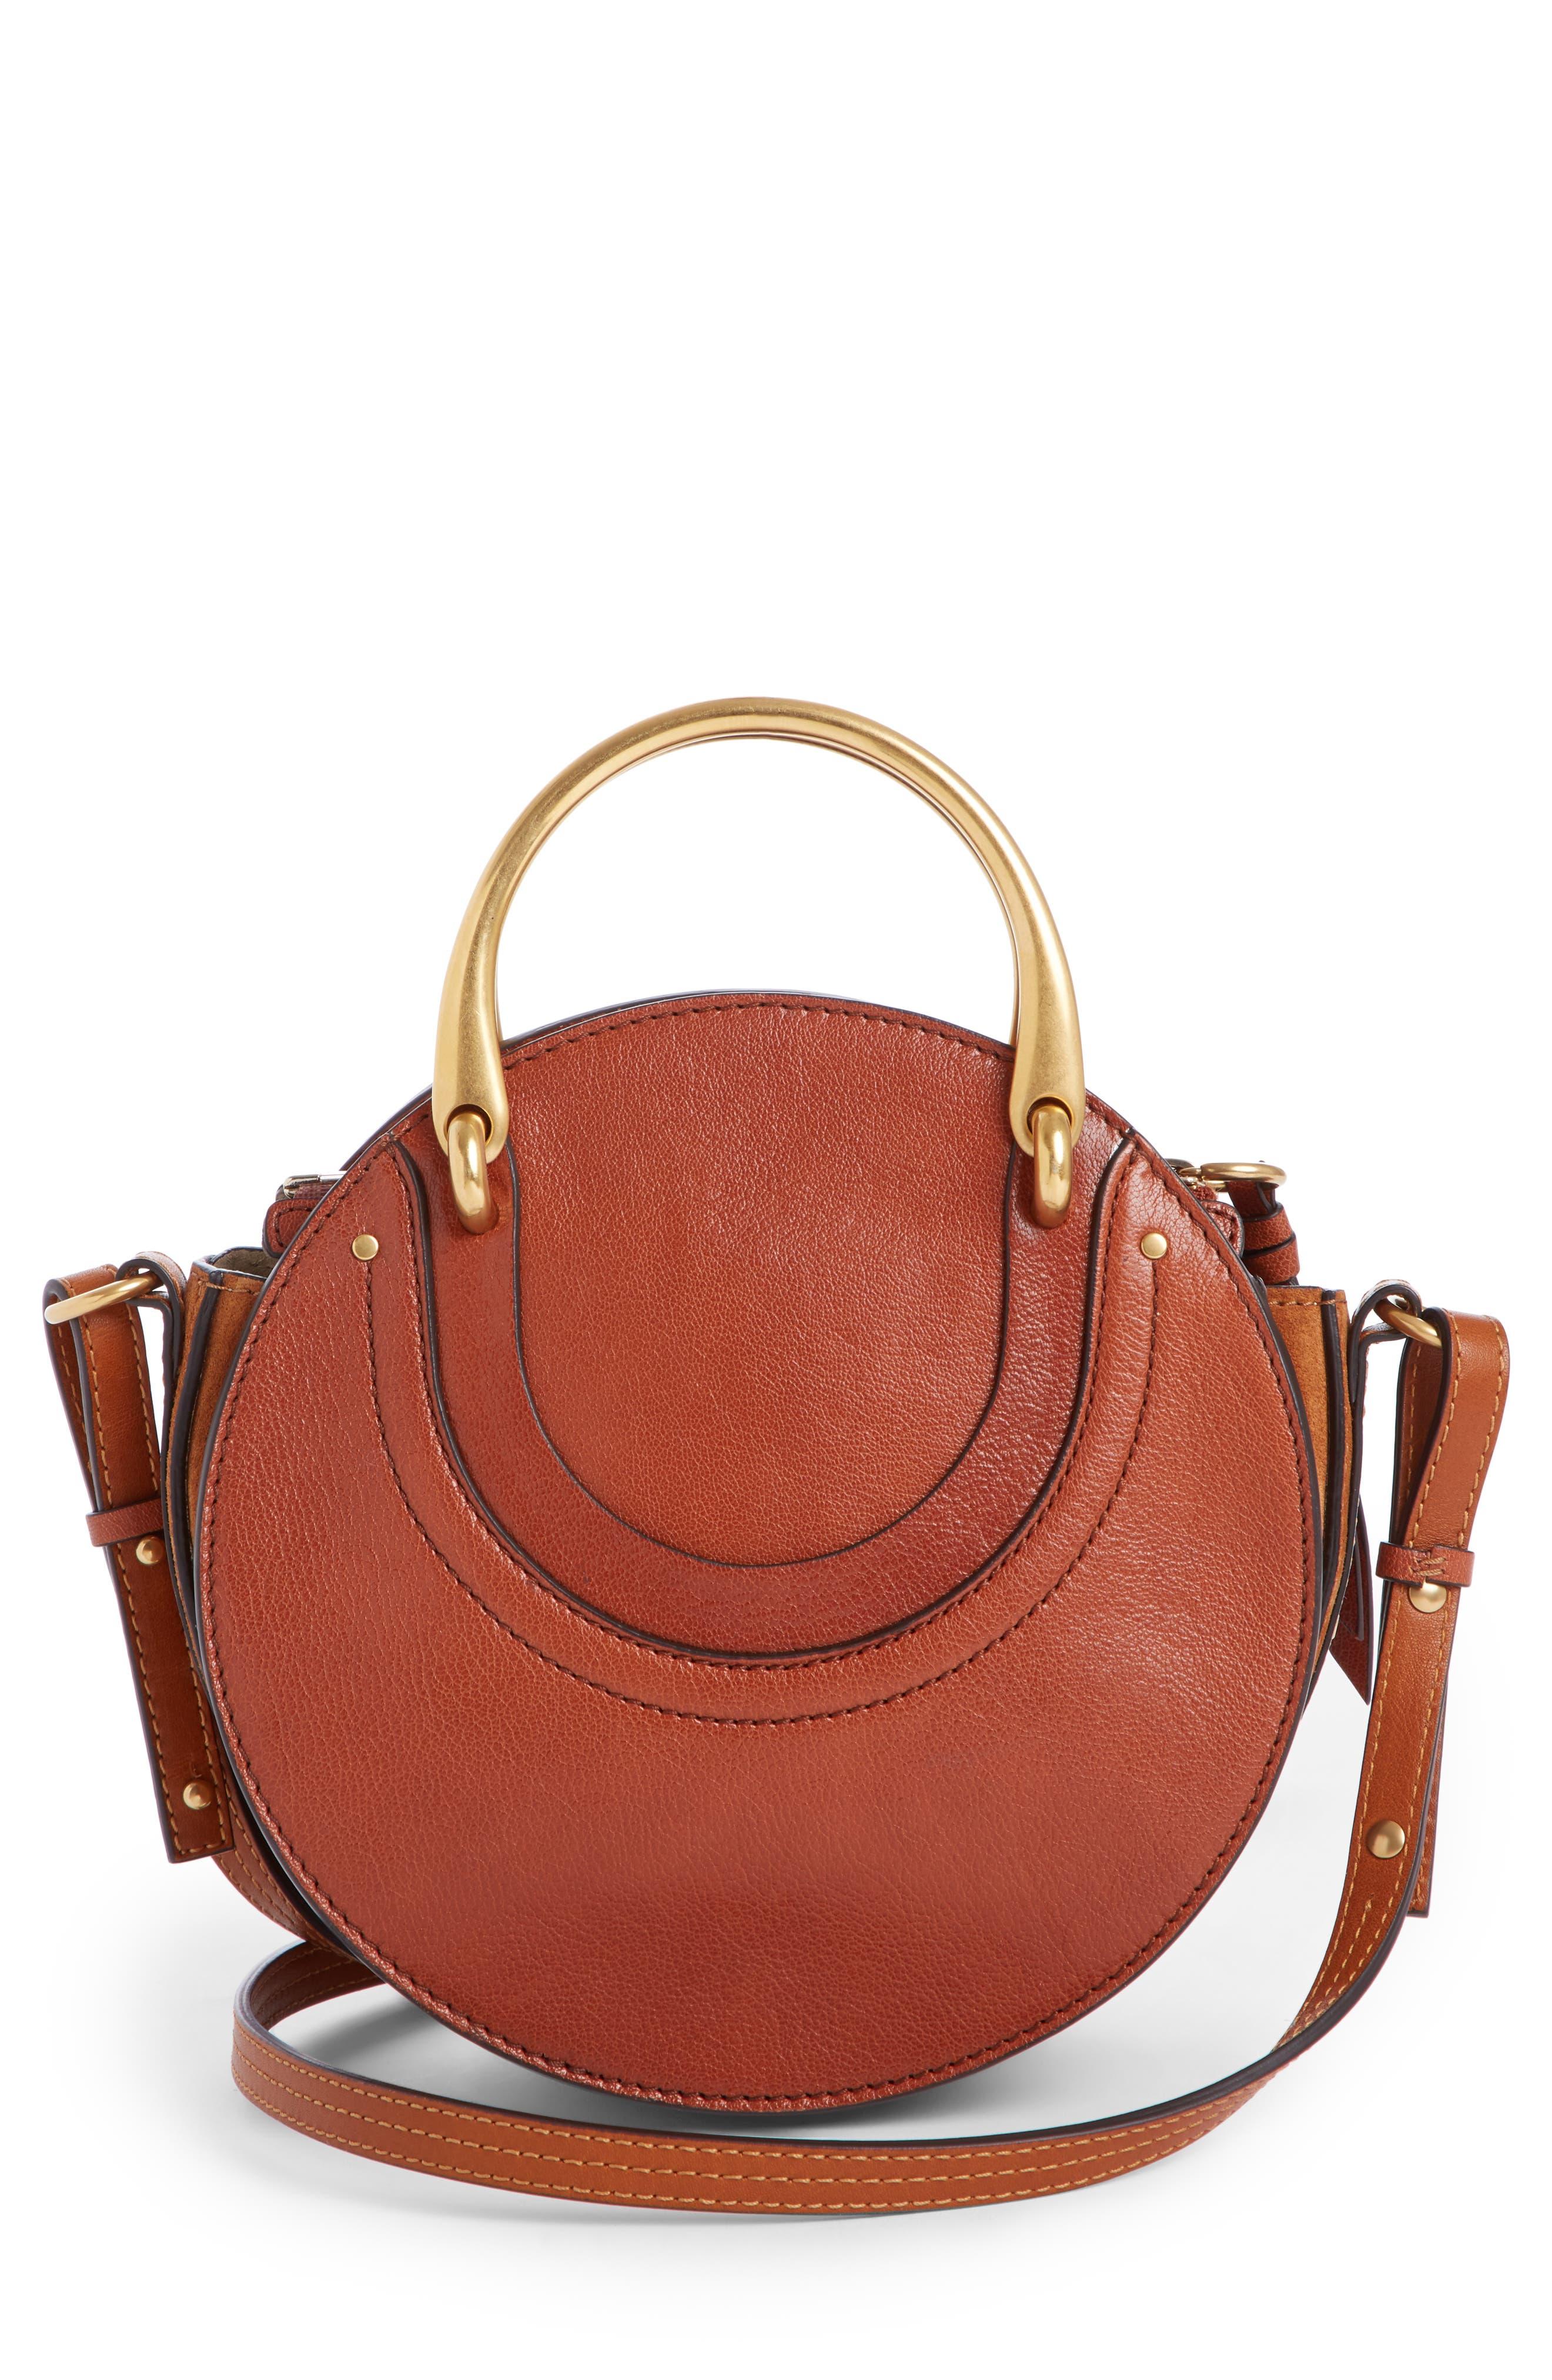 Pixie Leather Crossbody Bag,                             Alternate thumbnail 2, color,                             Saffron Red